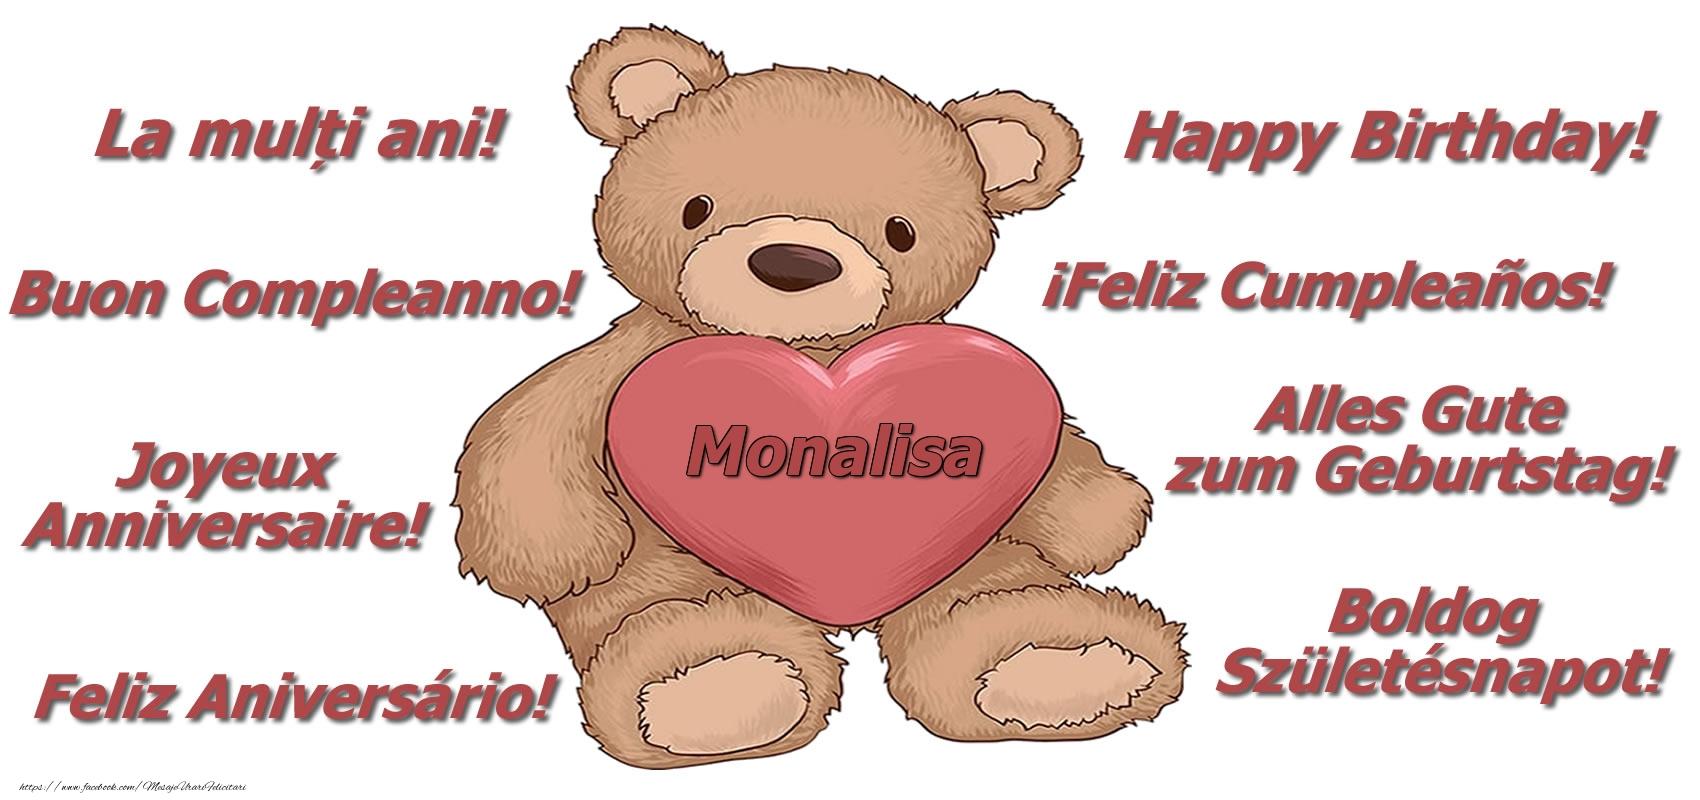 Felicitari de zi de nastere - La multi ani Monalisa! - Ursulet